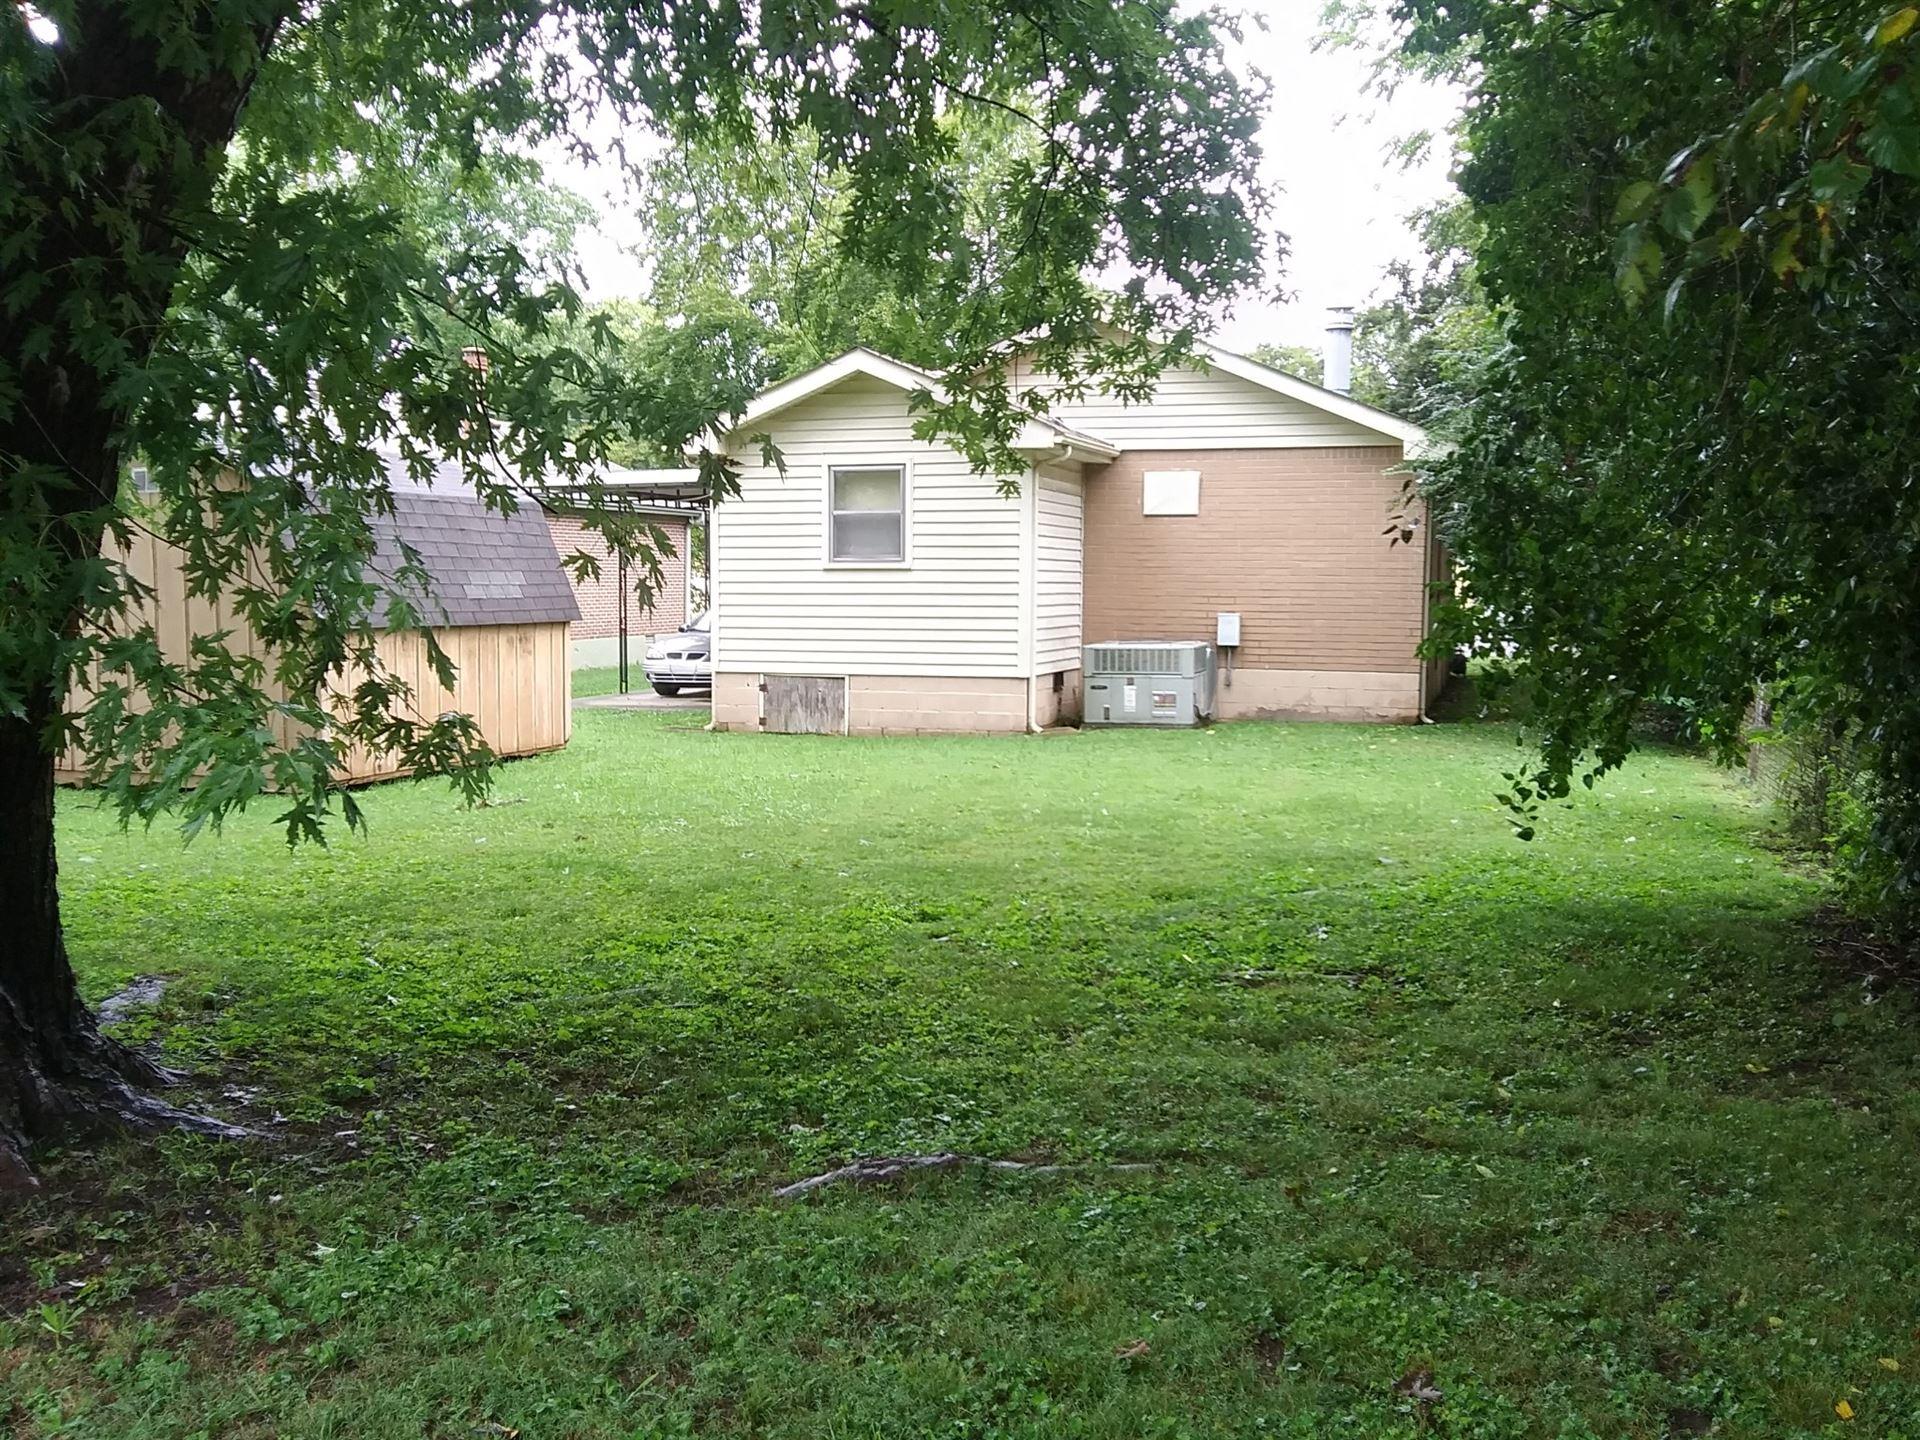 Photo of 209 East Ave, Goodlettsville, TN 37072 (MLS # 2292266)